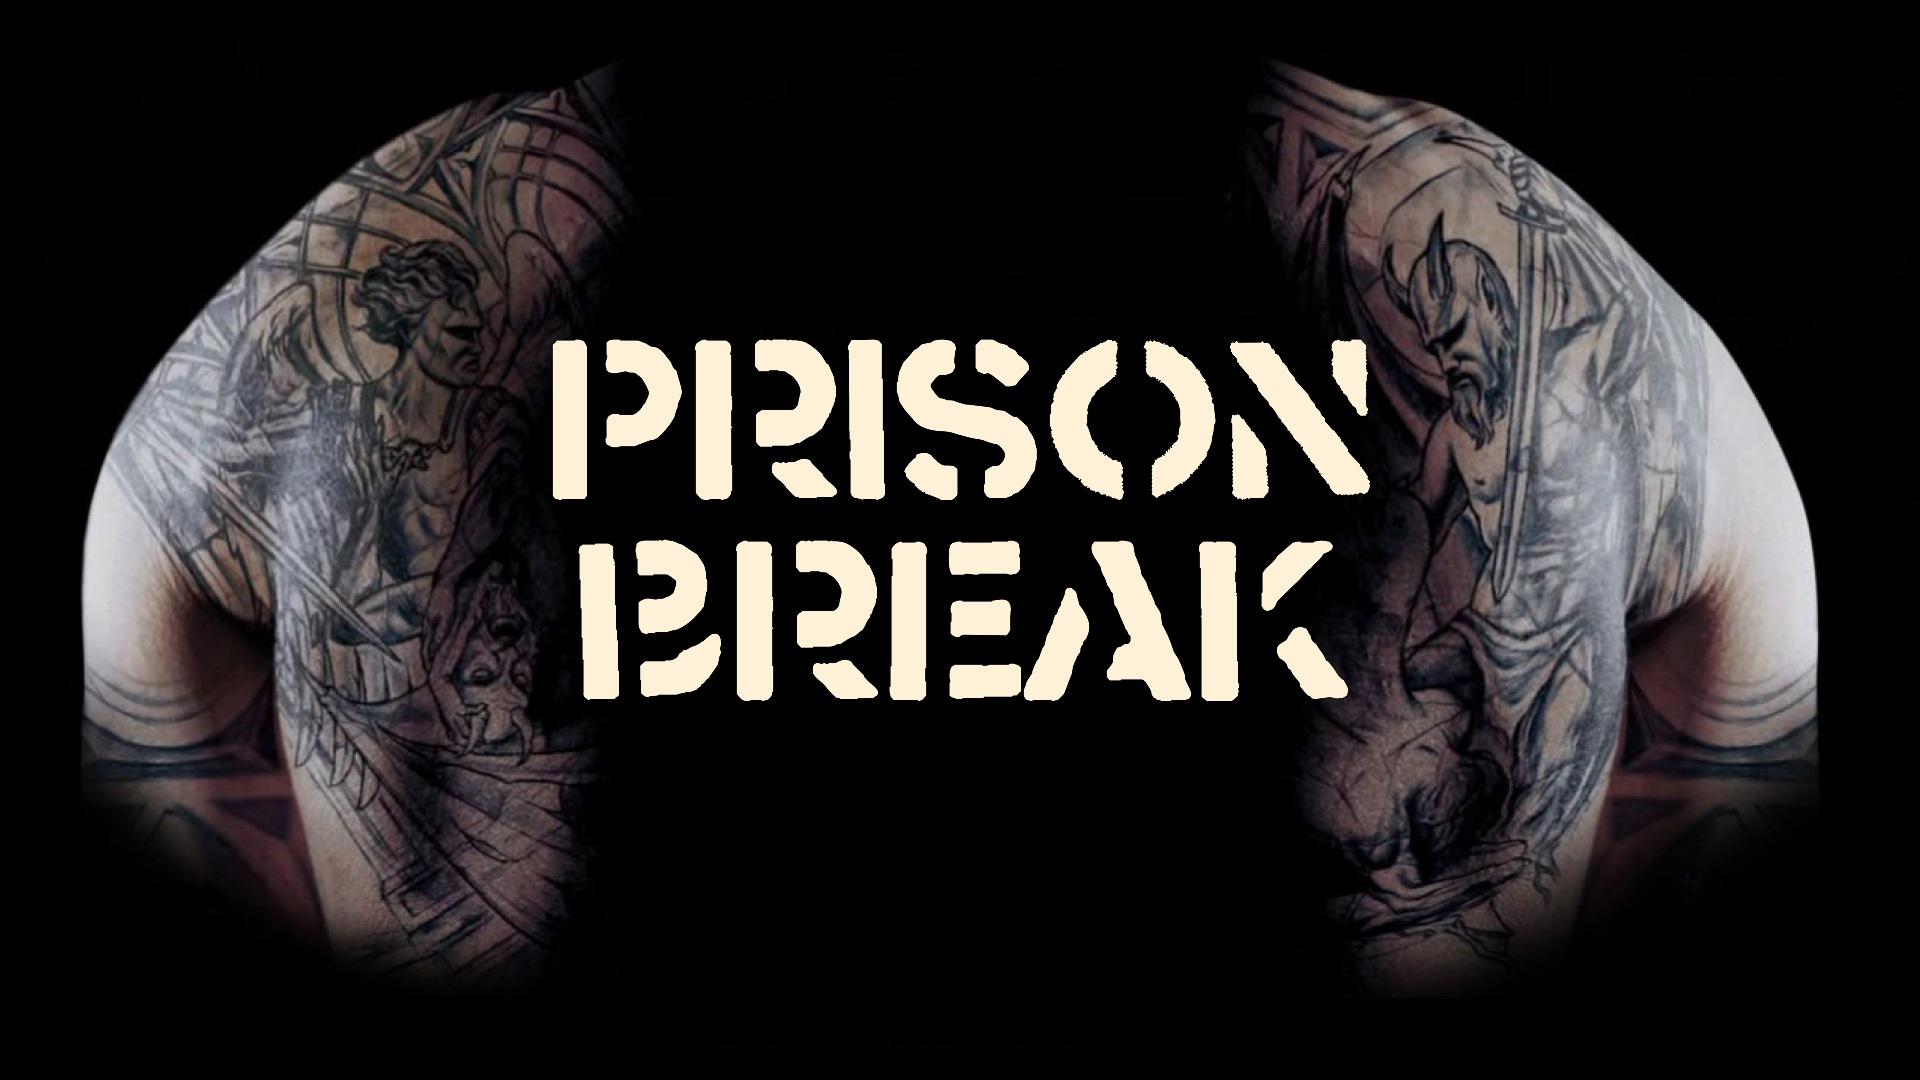 wallpapers of Prison Break You are downloading Prison Break wallpaper 1920x1080